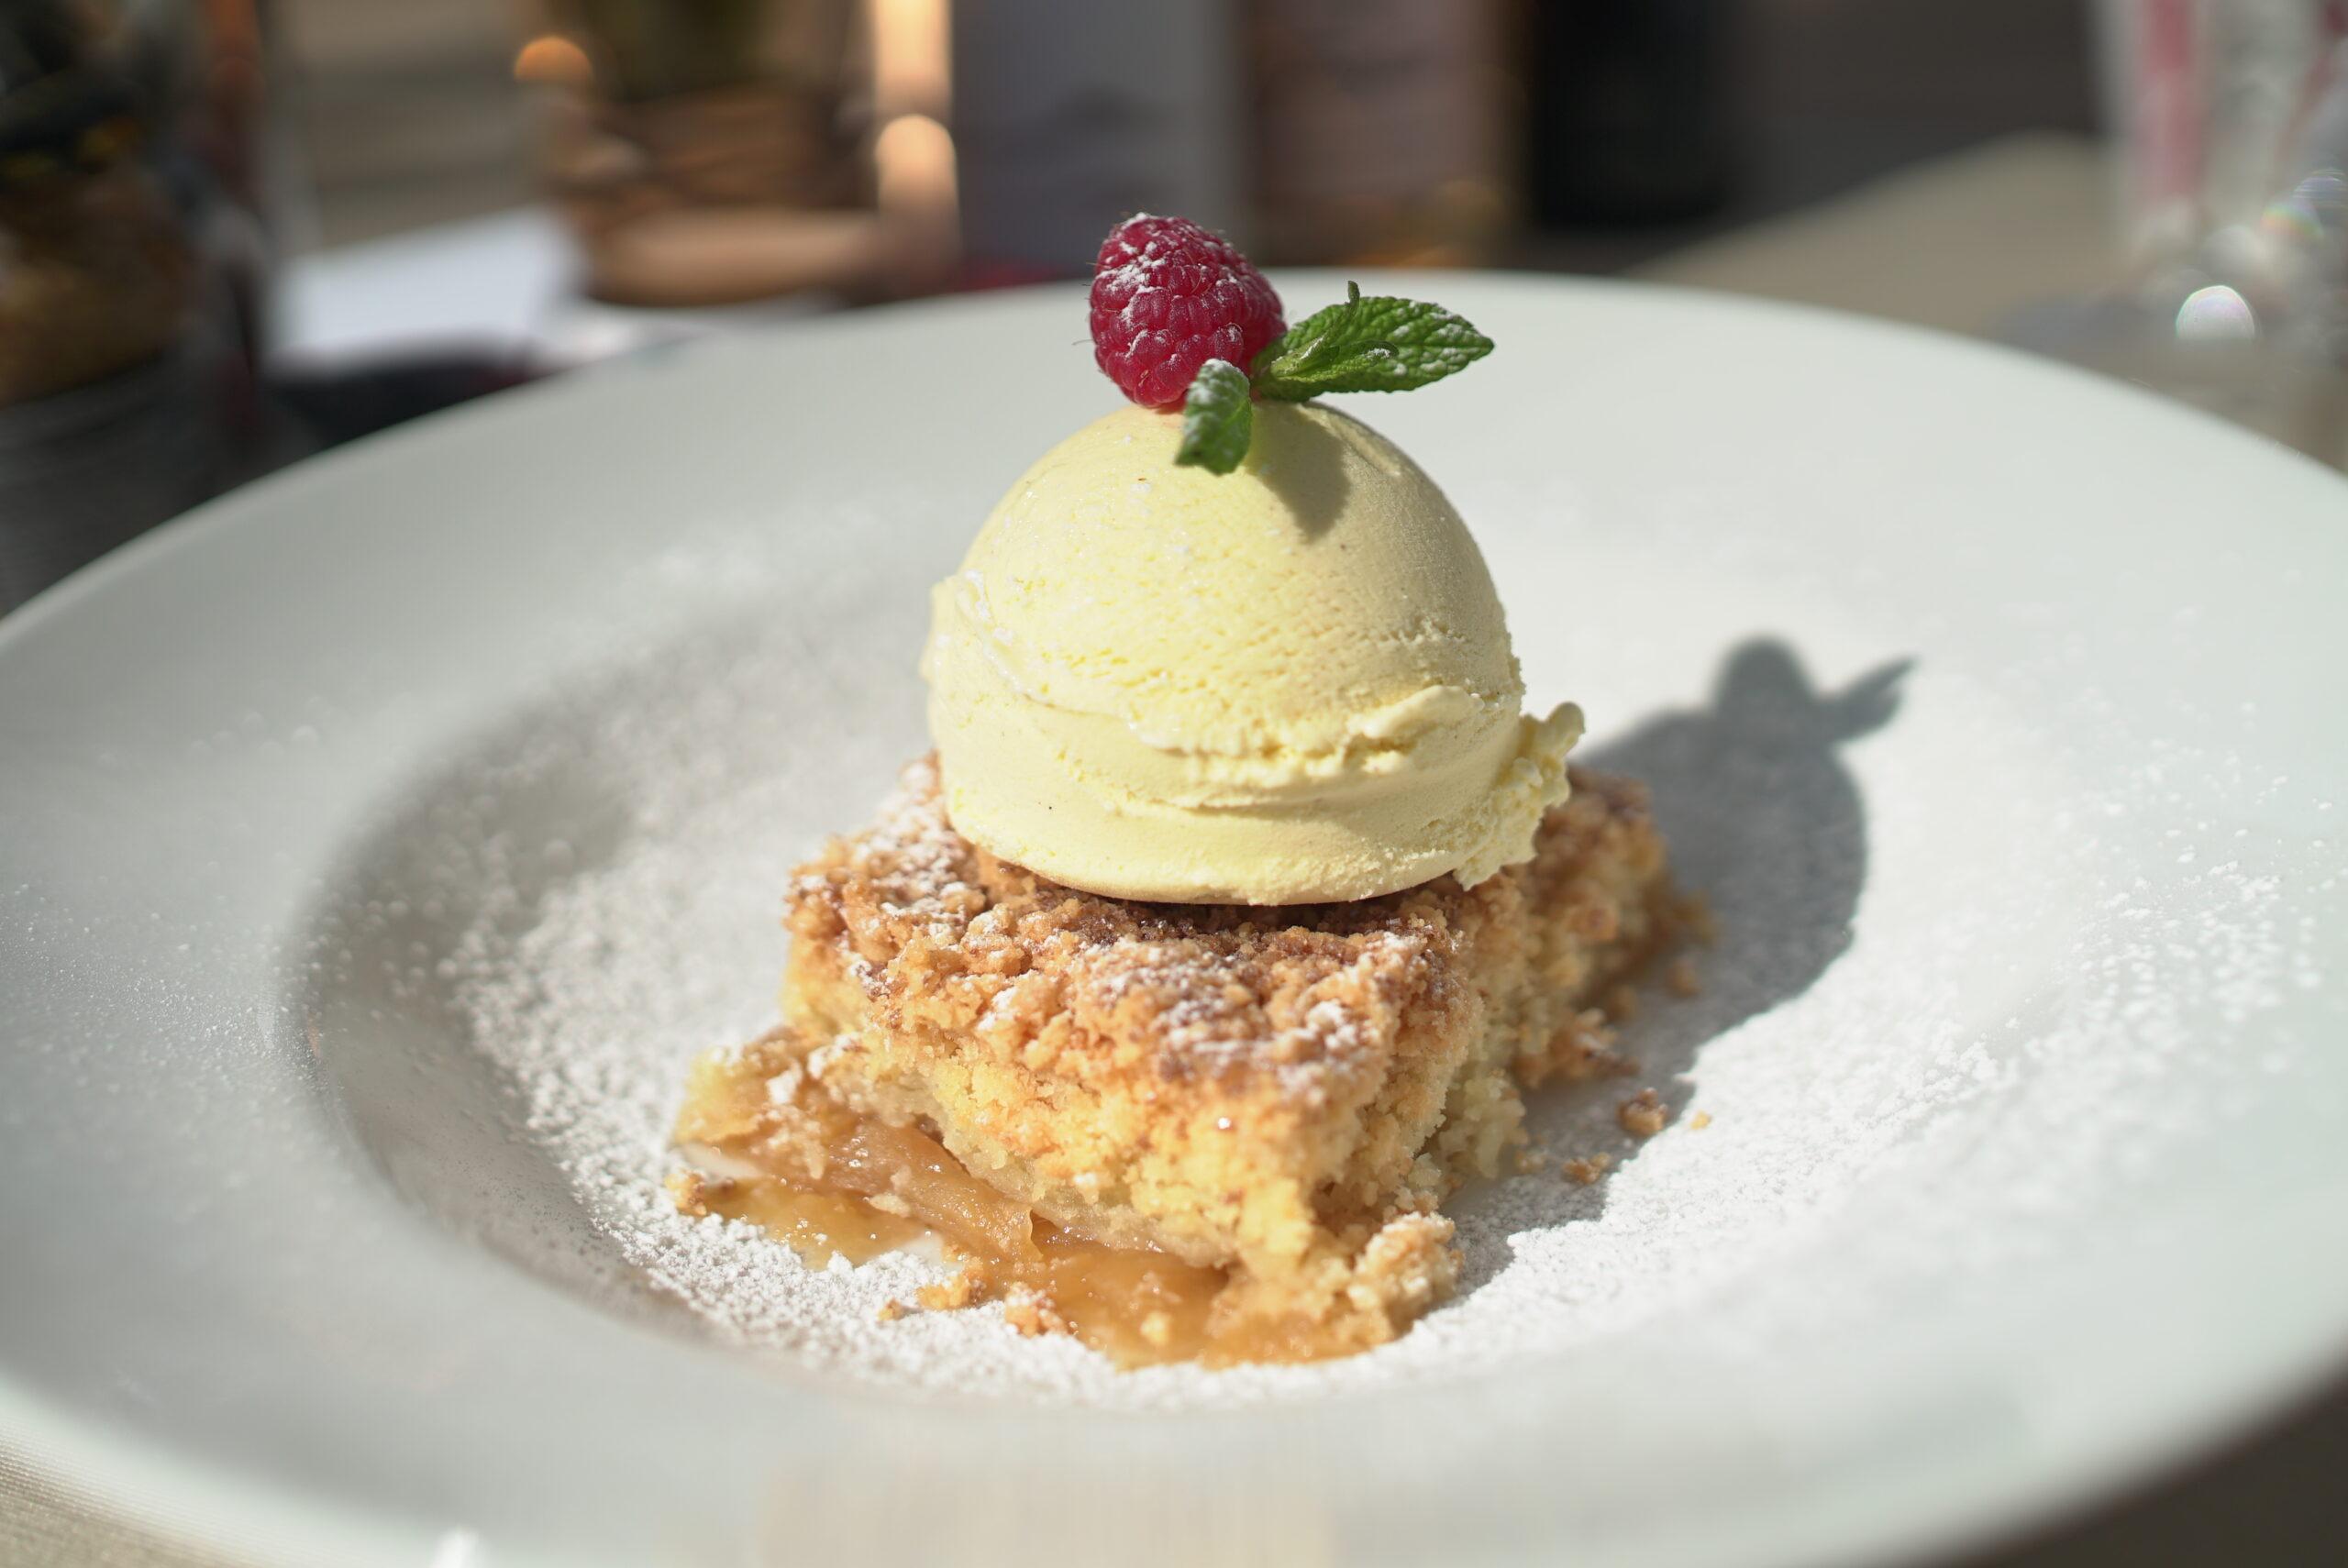 Dessert - Apple Crumble